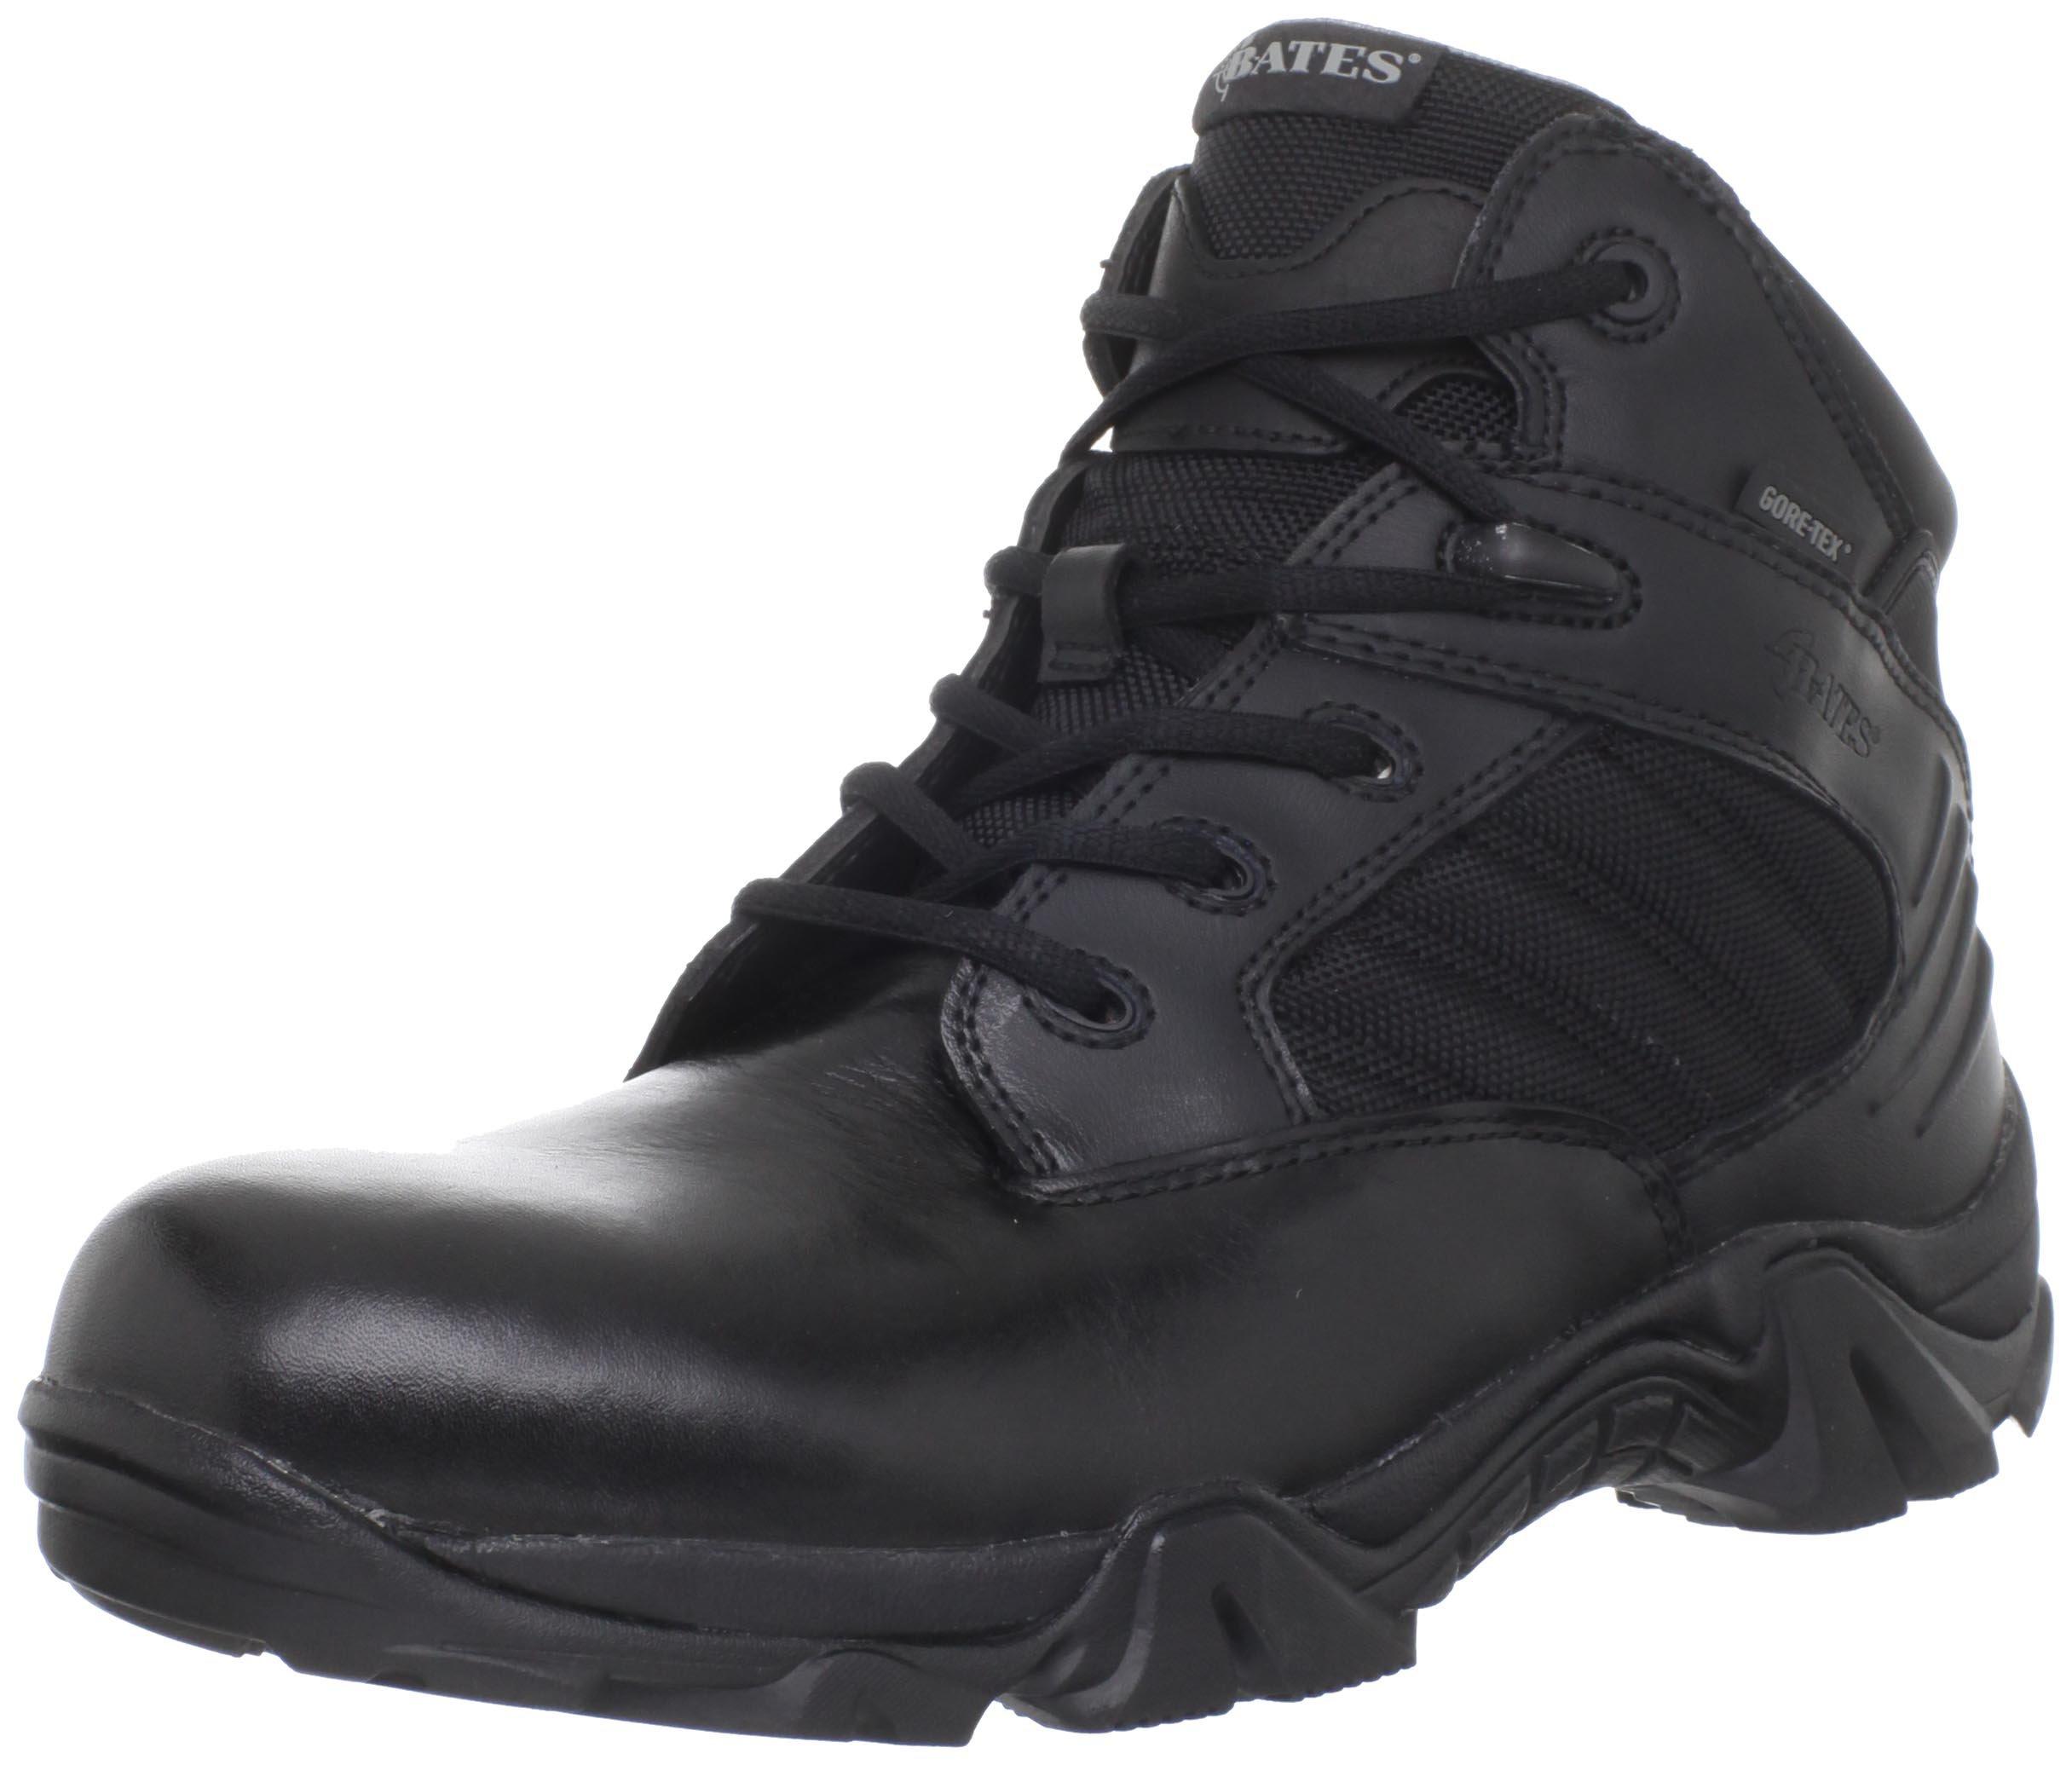 Bates Men's Gx-4 GTX Work Boot,Black,8 EW US